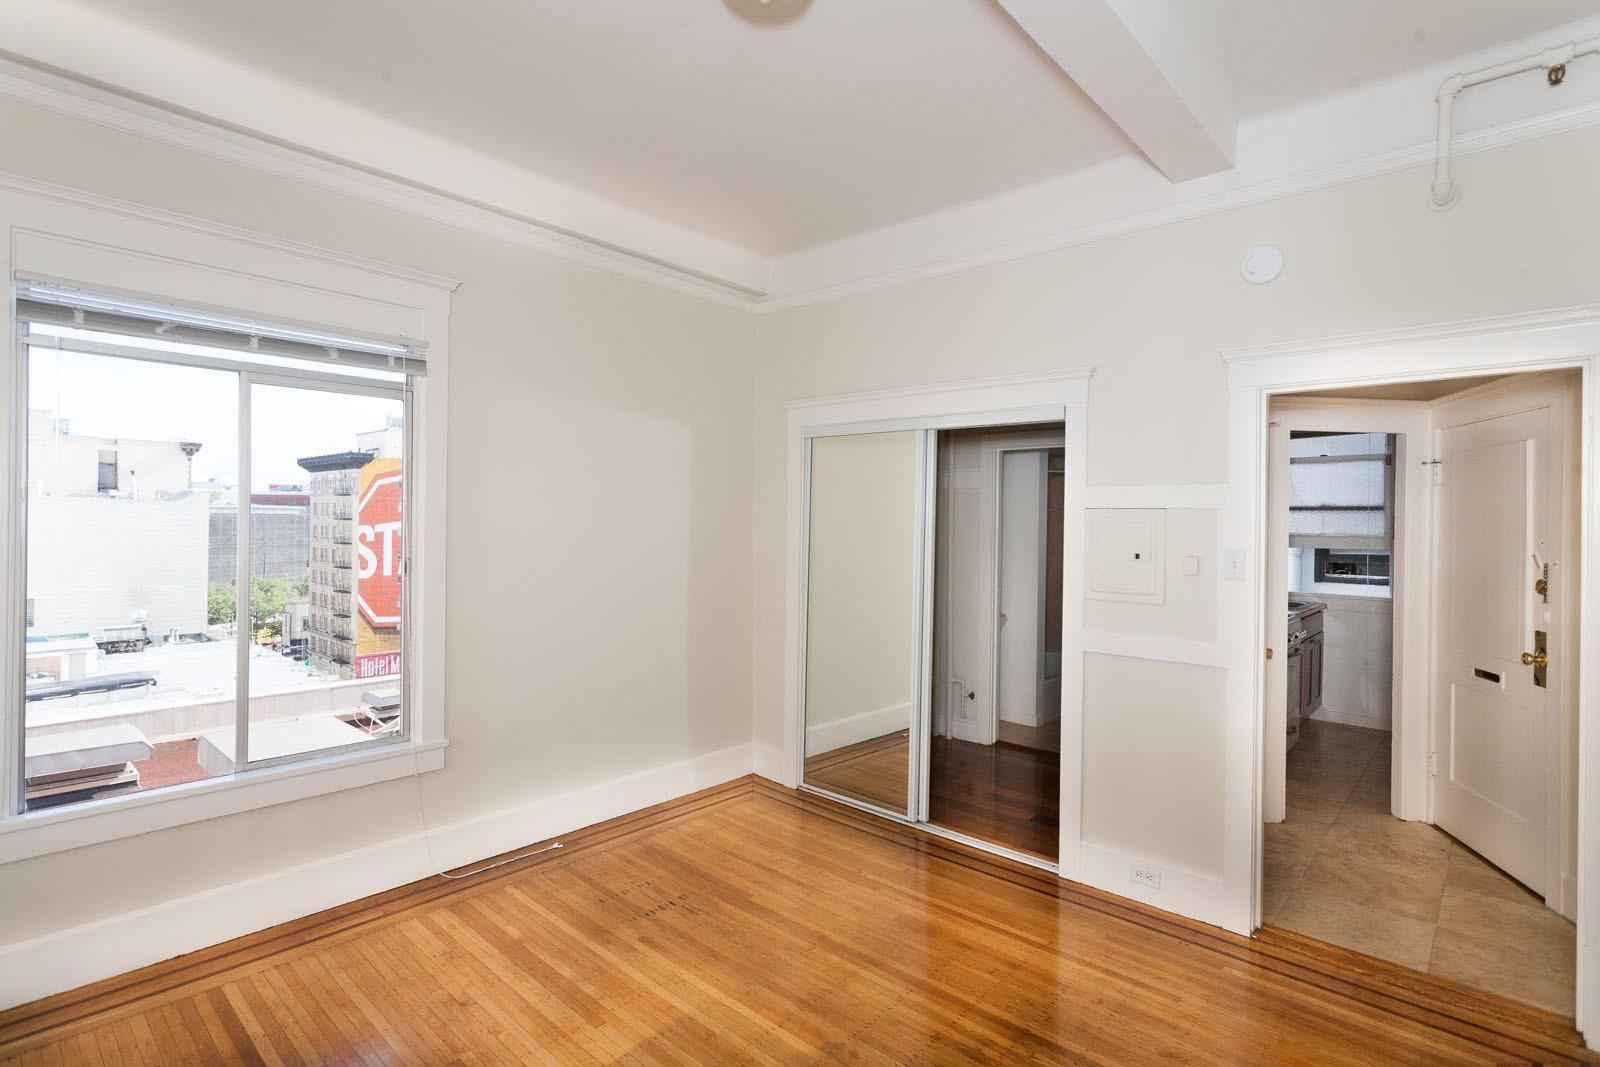 124 MASON Apartments for rent